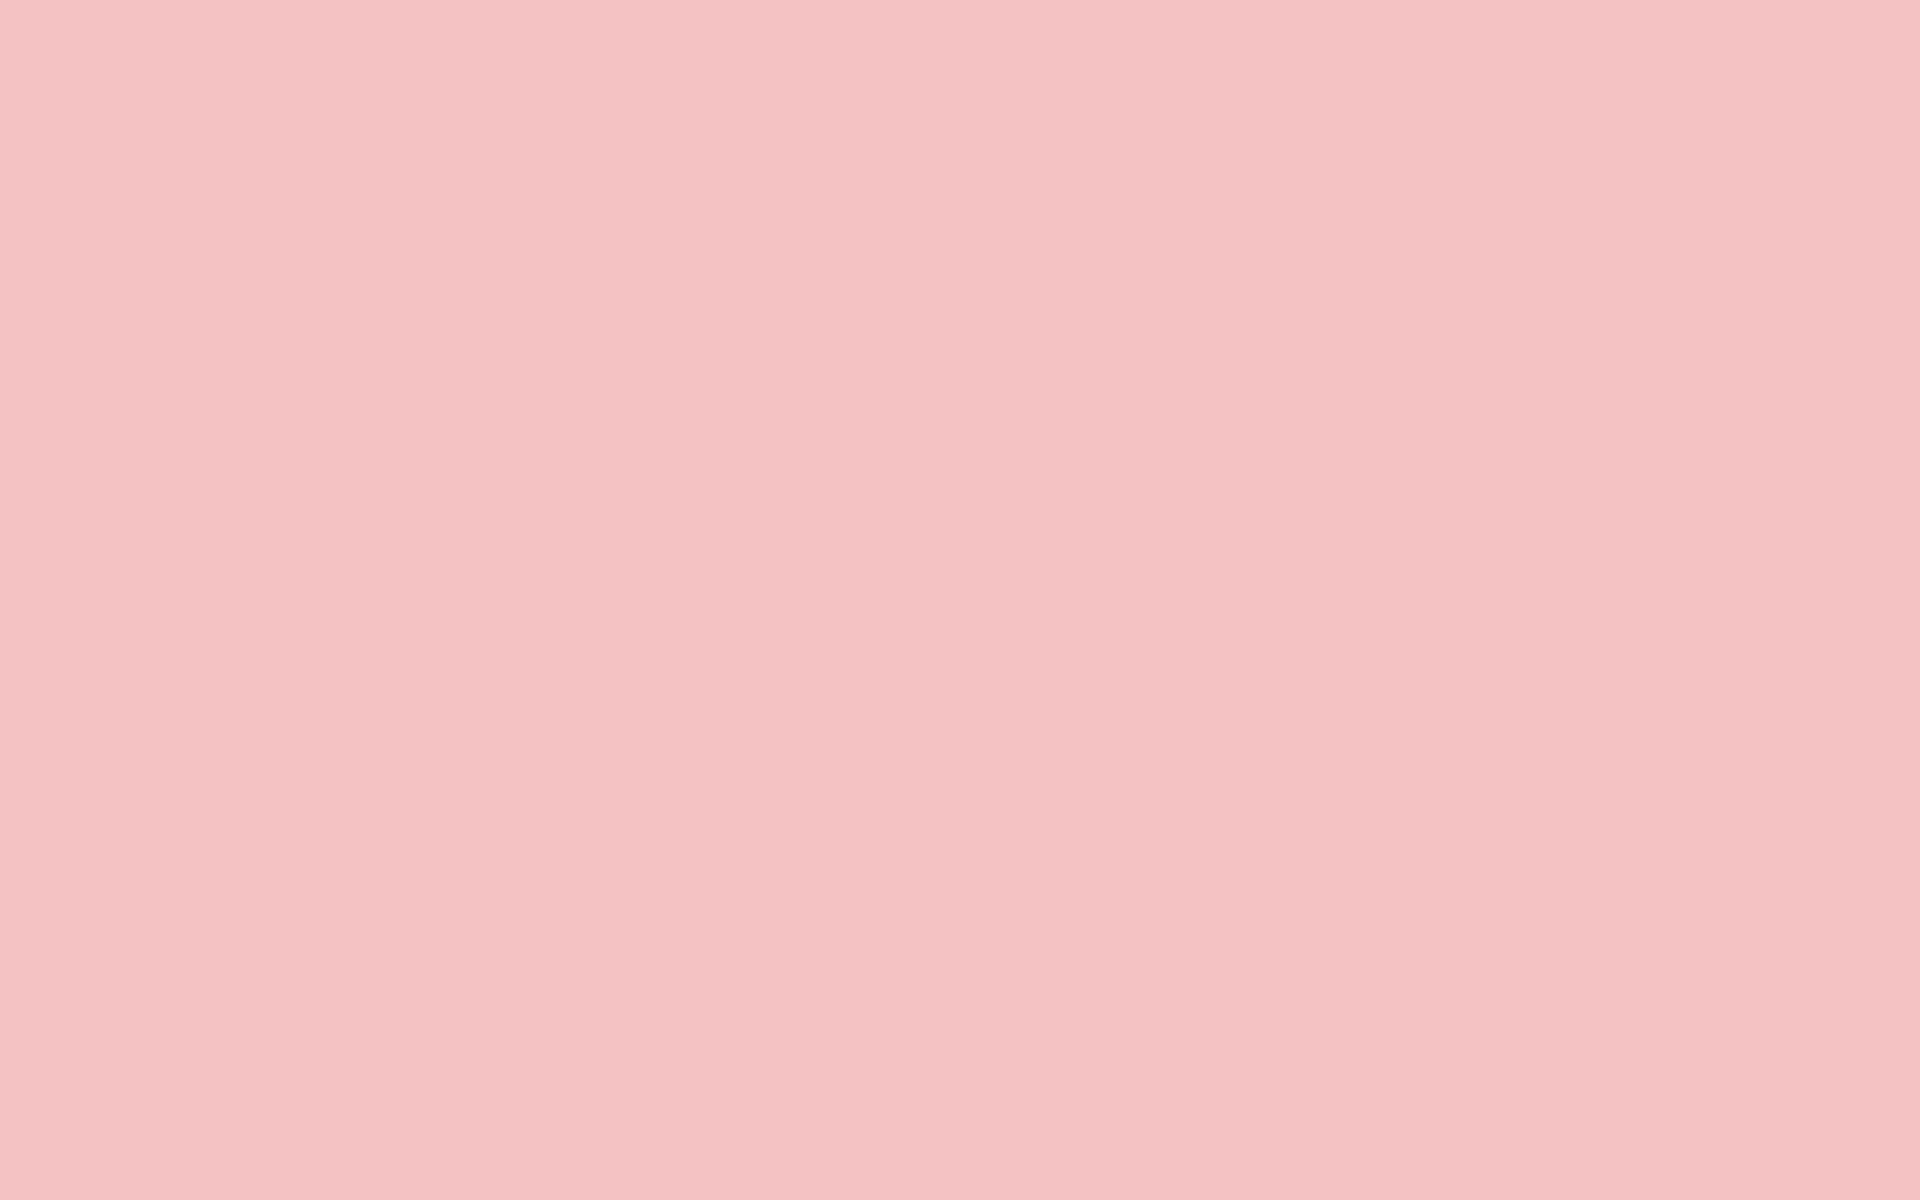 Light Pink Backgrounds - WallpaperSafari